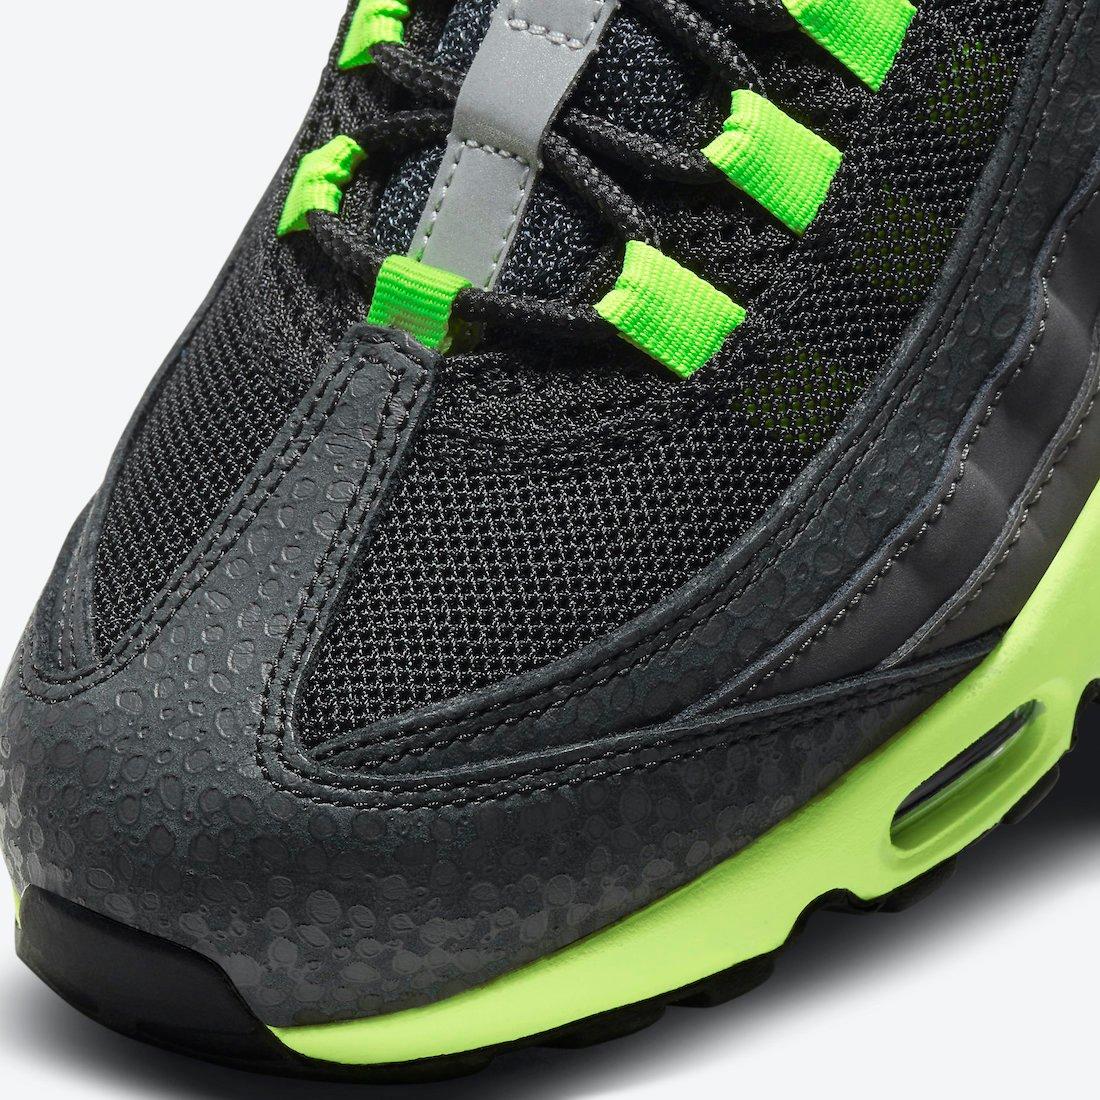 Nike Air Max 95 Kiss My Airs DJ4627-001 Release Date Info